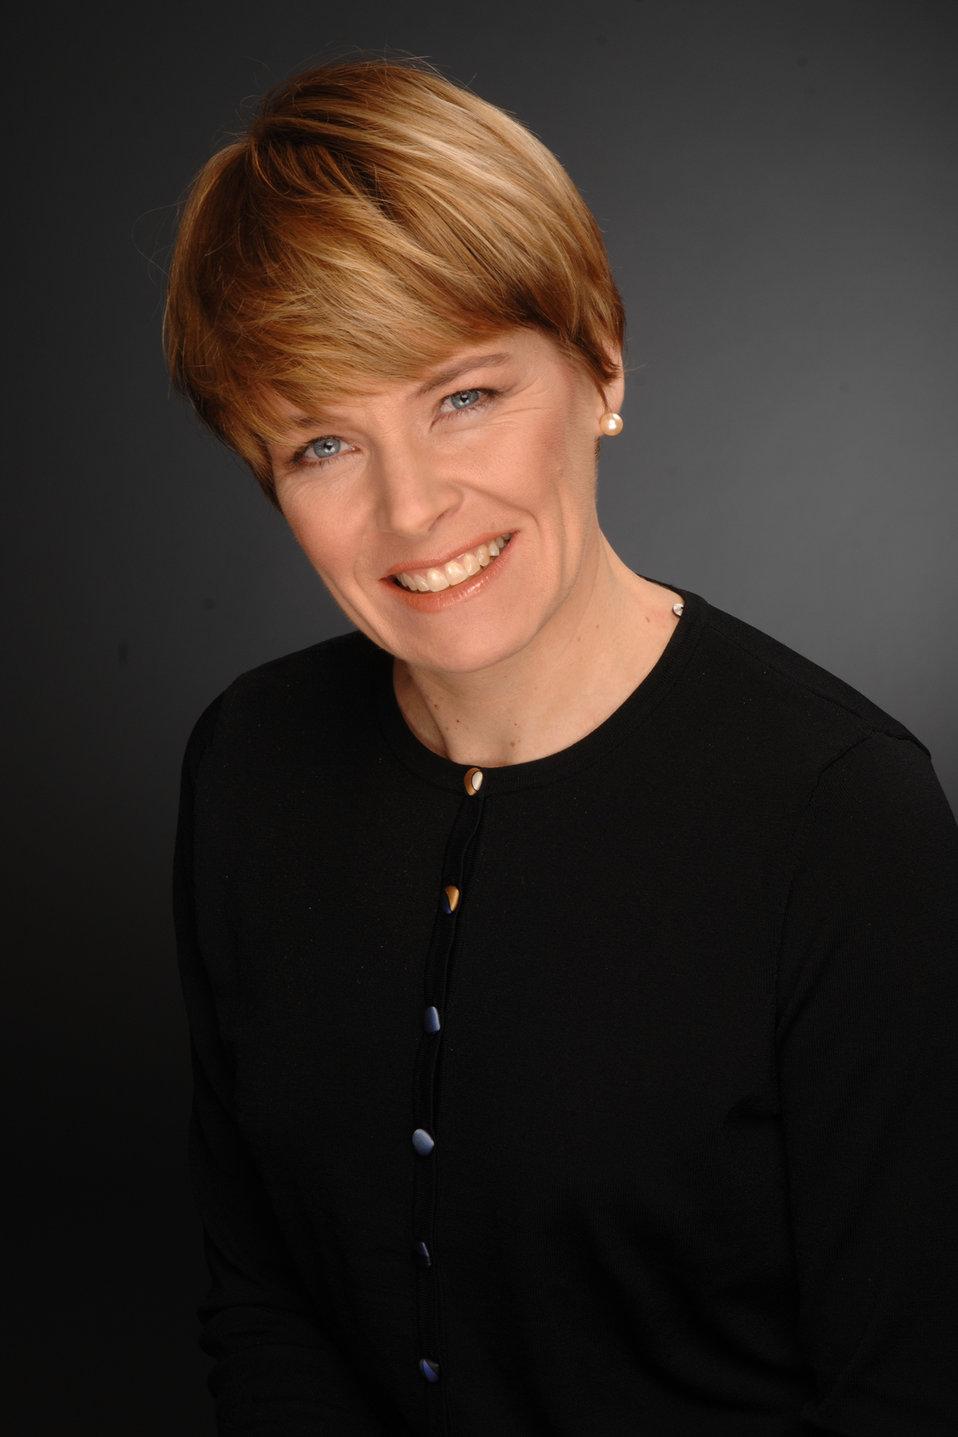 ARPA-E Deputy Director for Commercialization Cheryl Martin